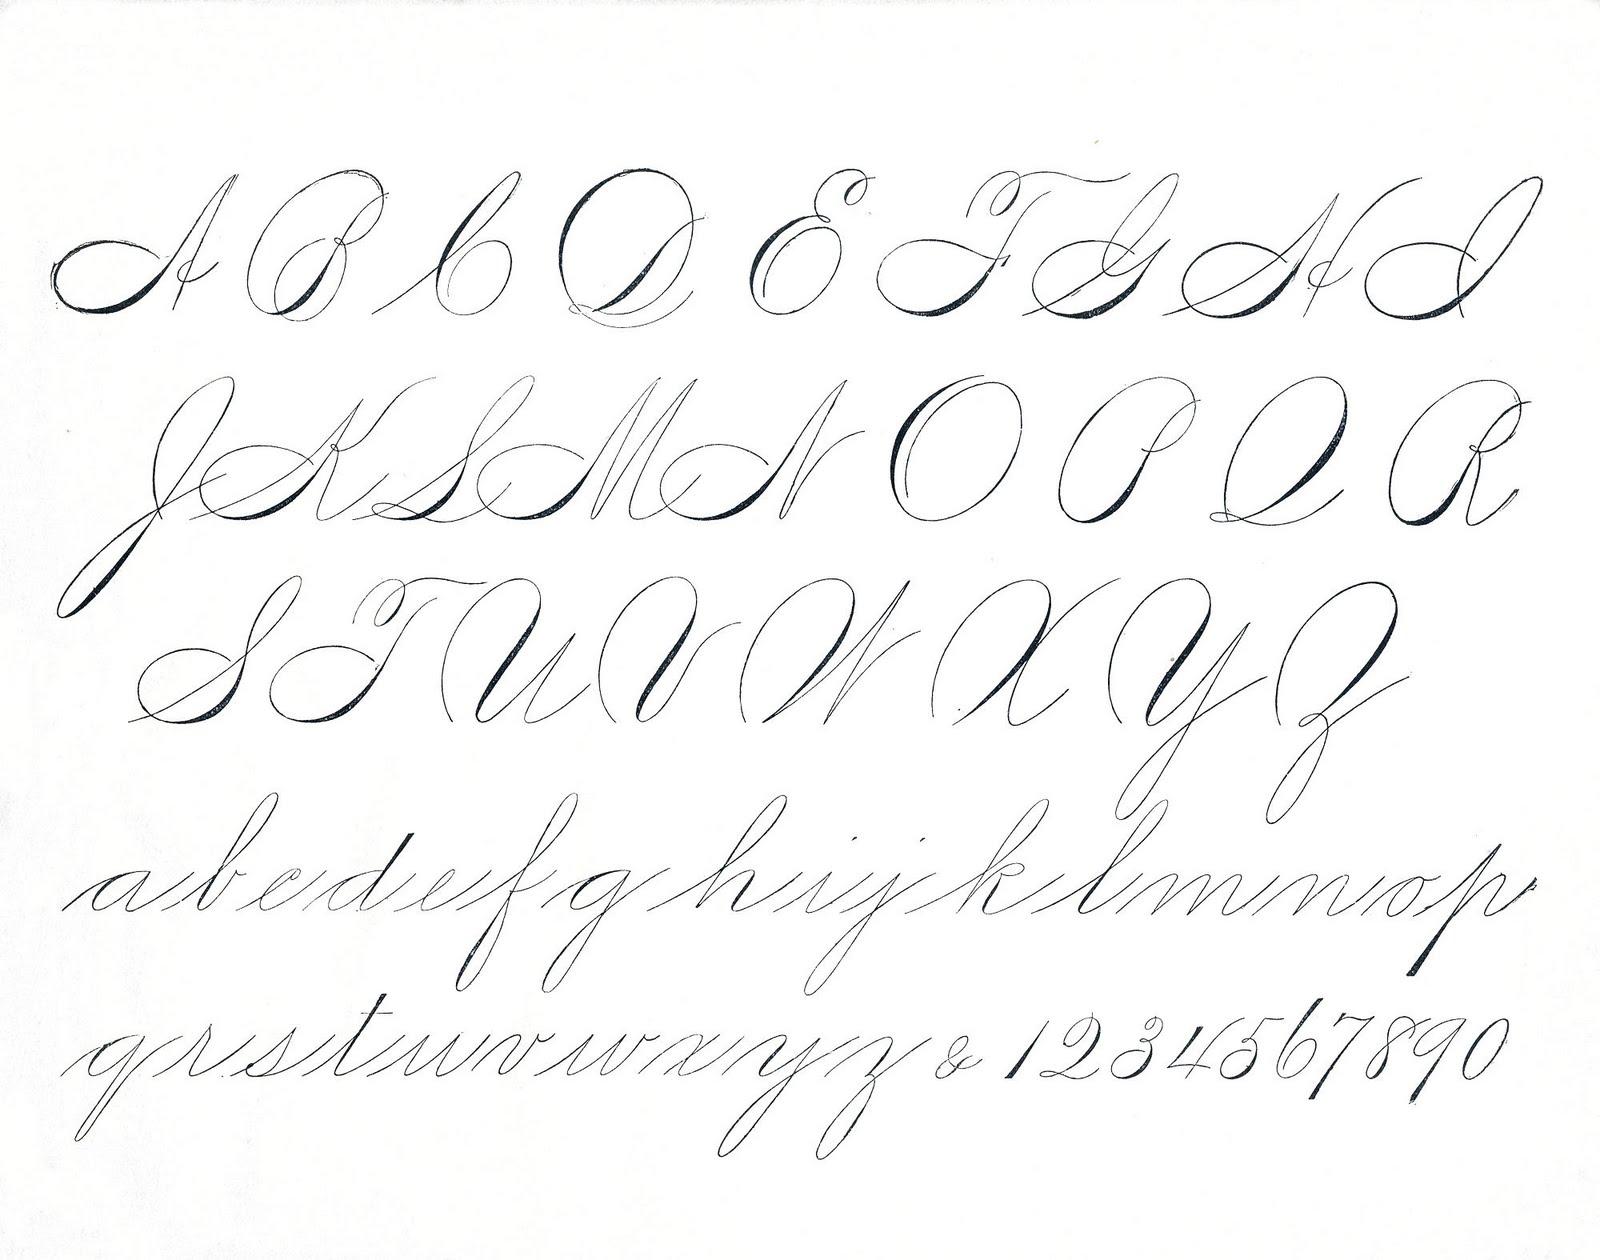 Calligraphy clipart creative Antique Script Clip Spencerian Free